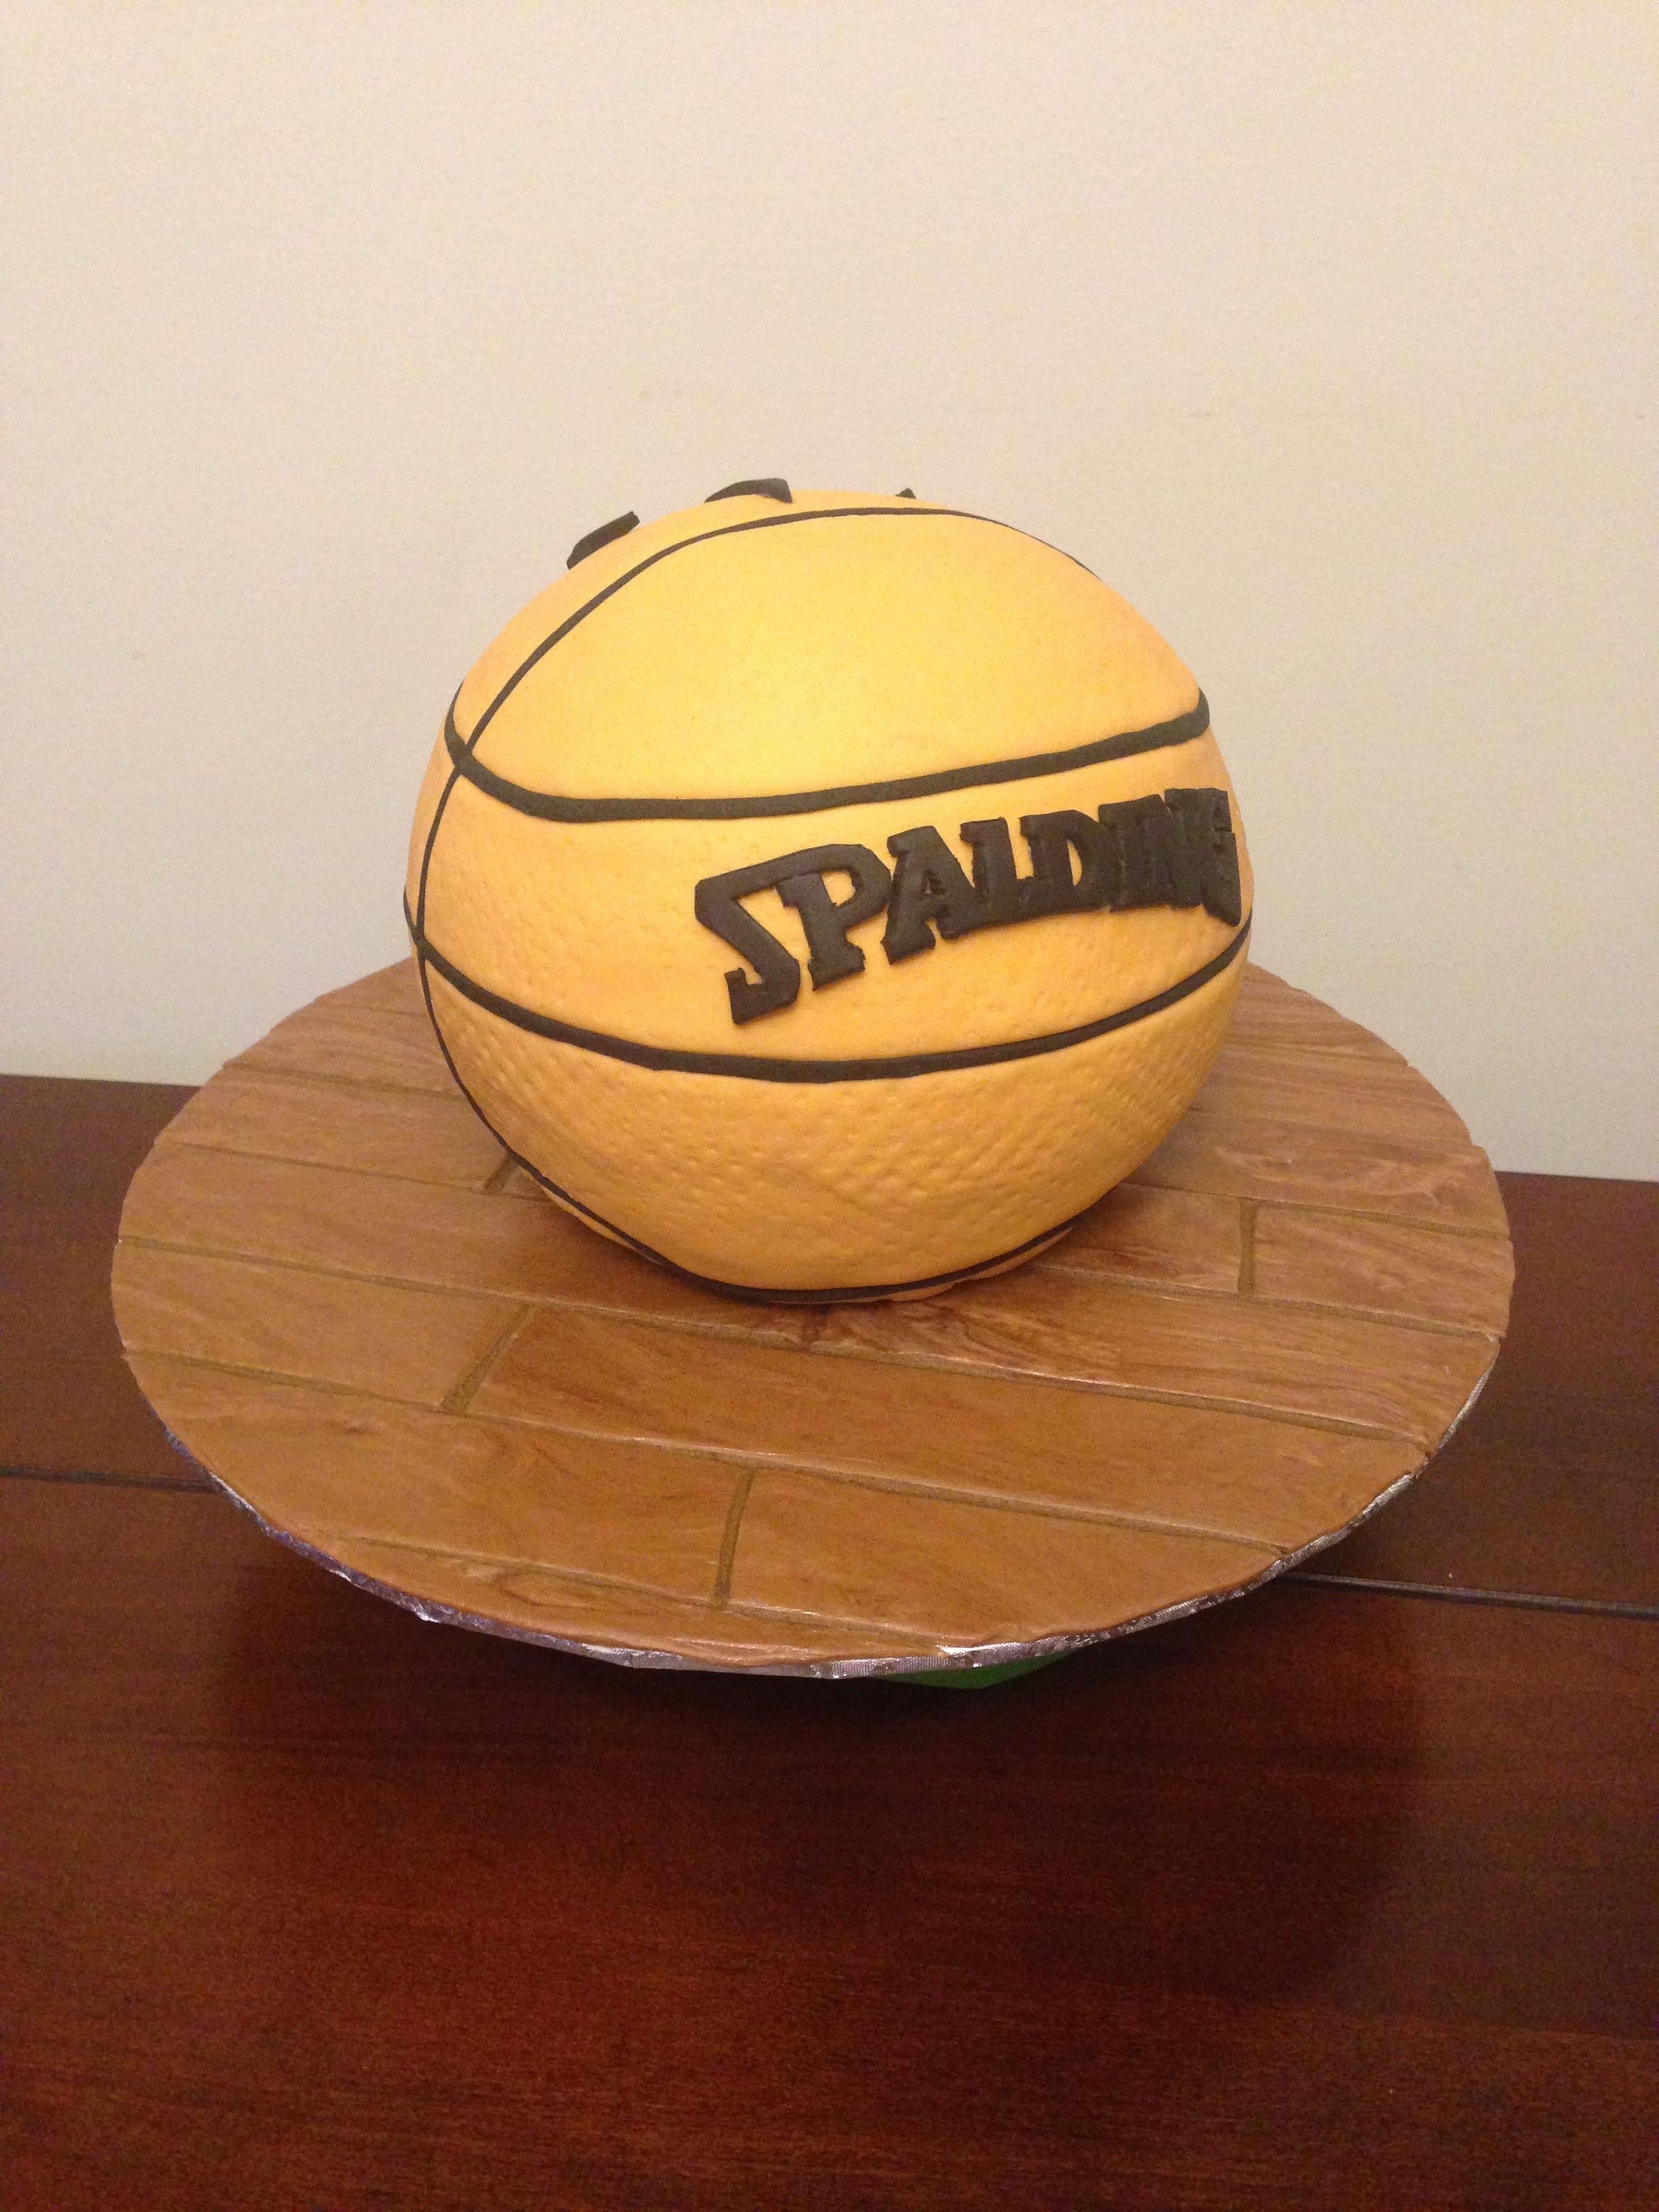 Toronto Raptors Basketball Cake